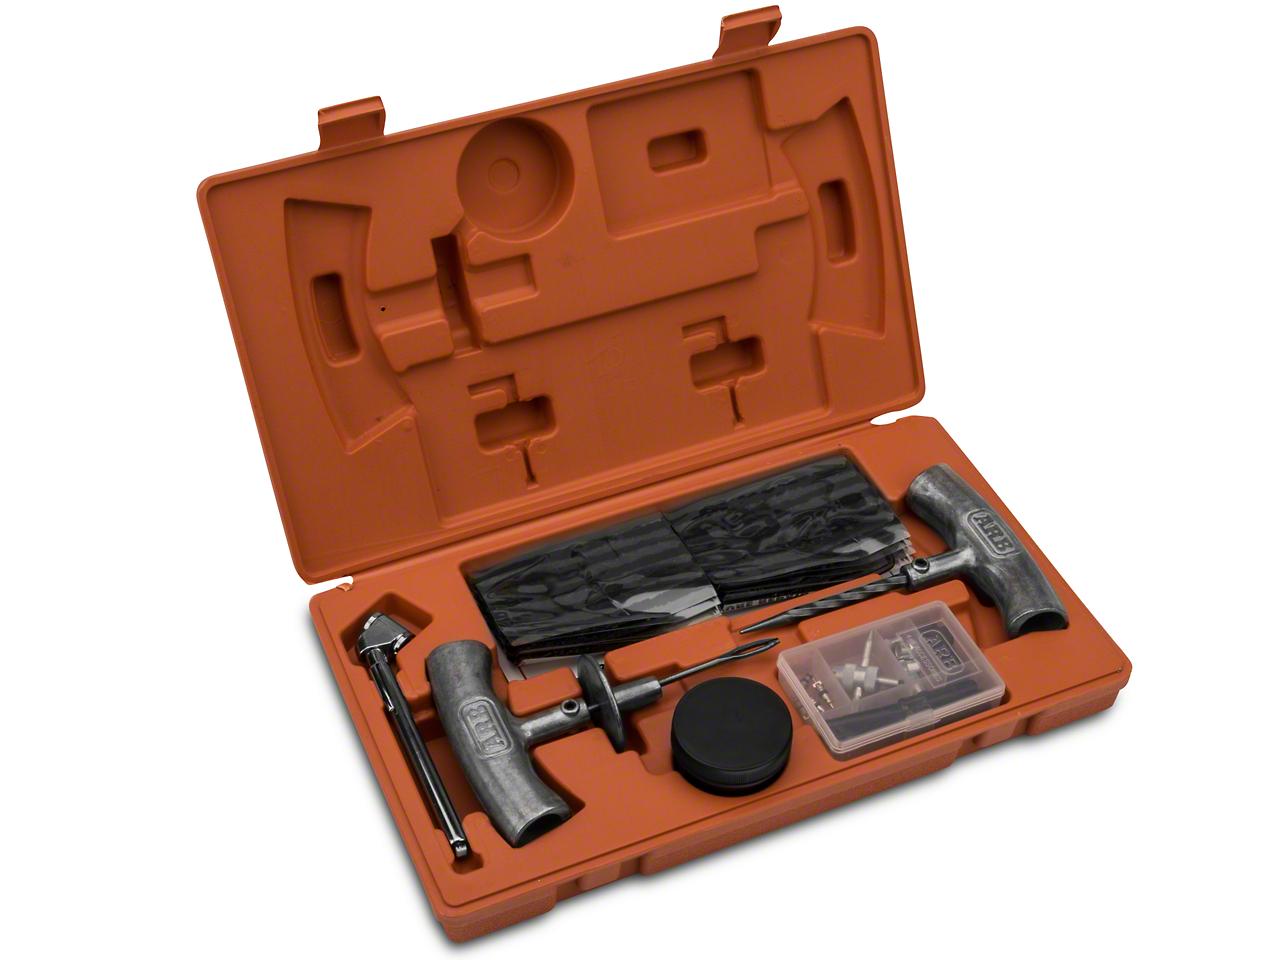 ARB Speedy Seal Tire Repair Kit (87-17 Wrangler YJ, TJ, & JK)